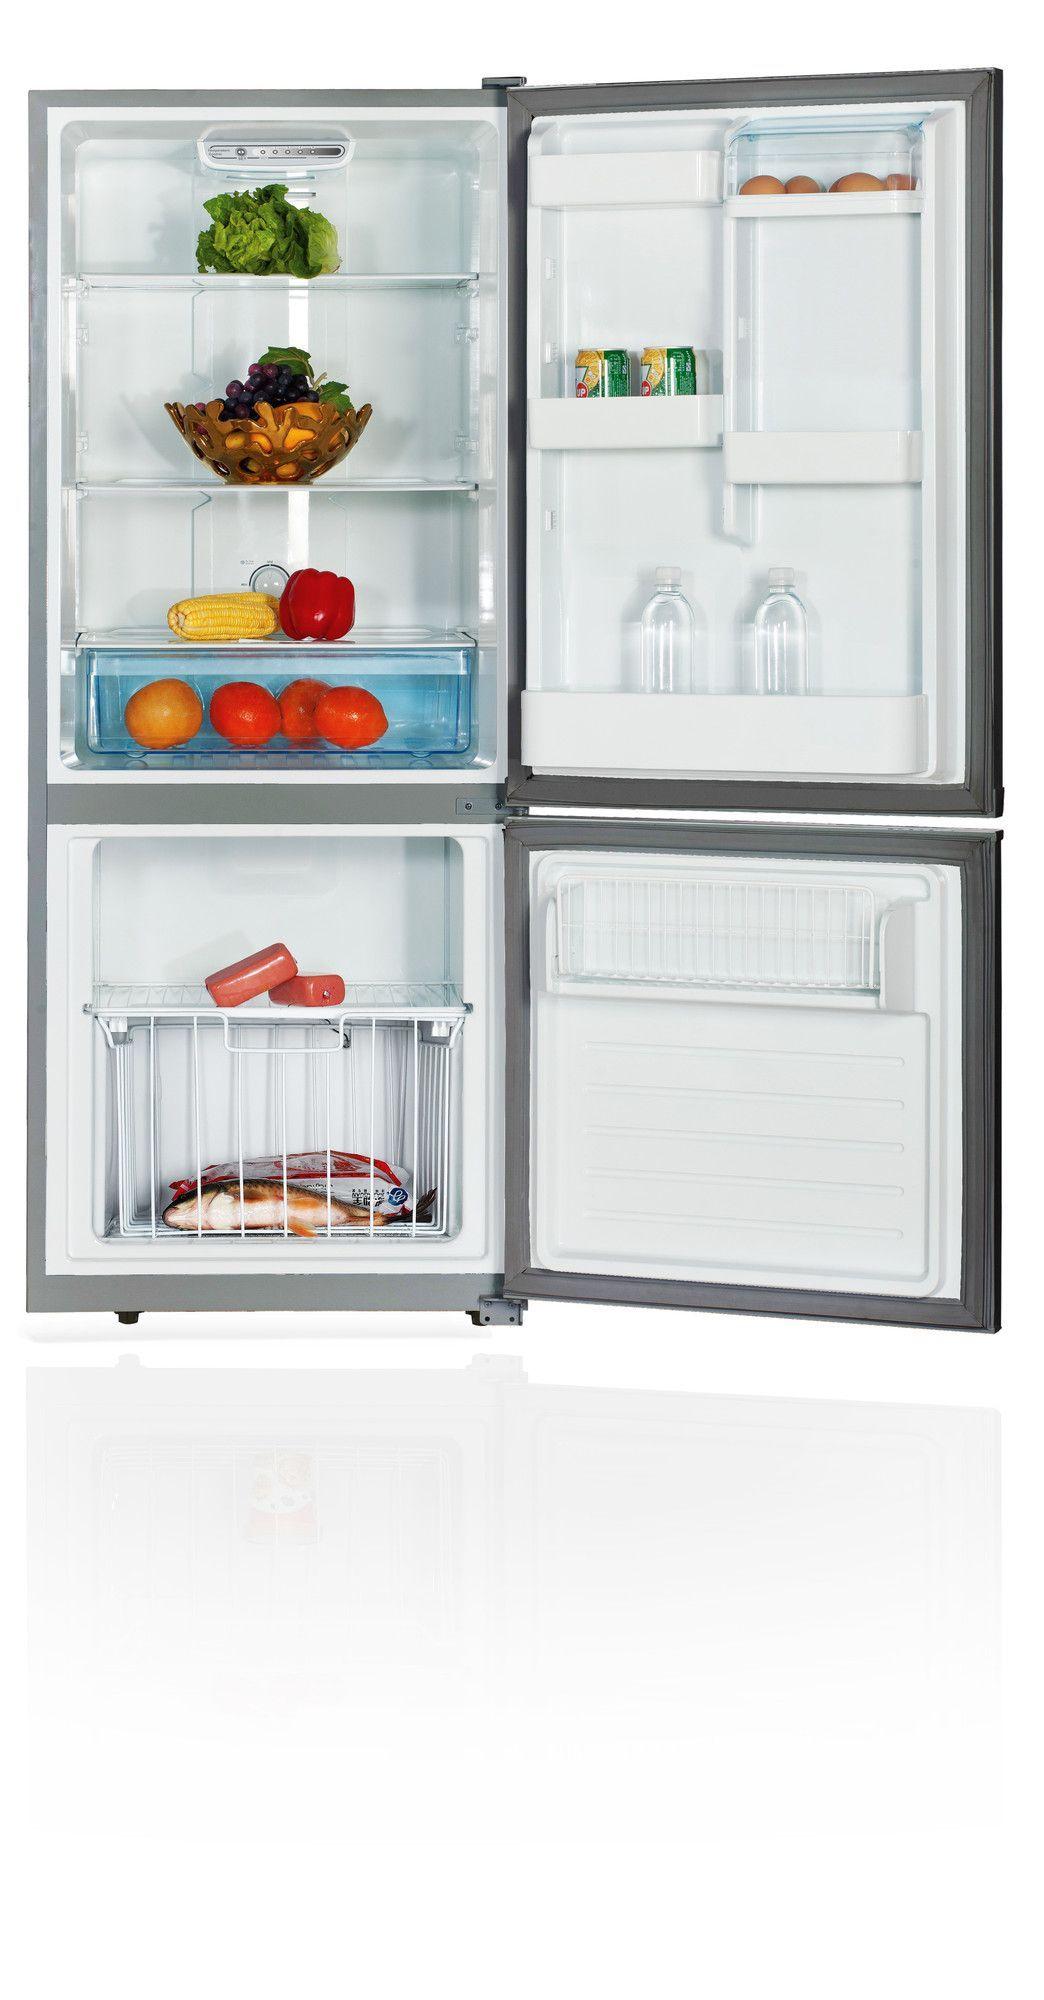 10 2 cu ft Bottom Freezer Refrigerator Products